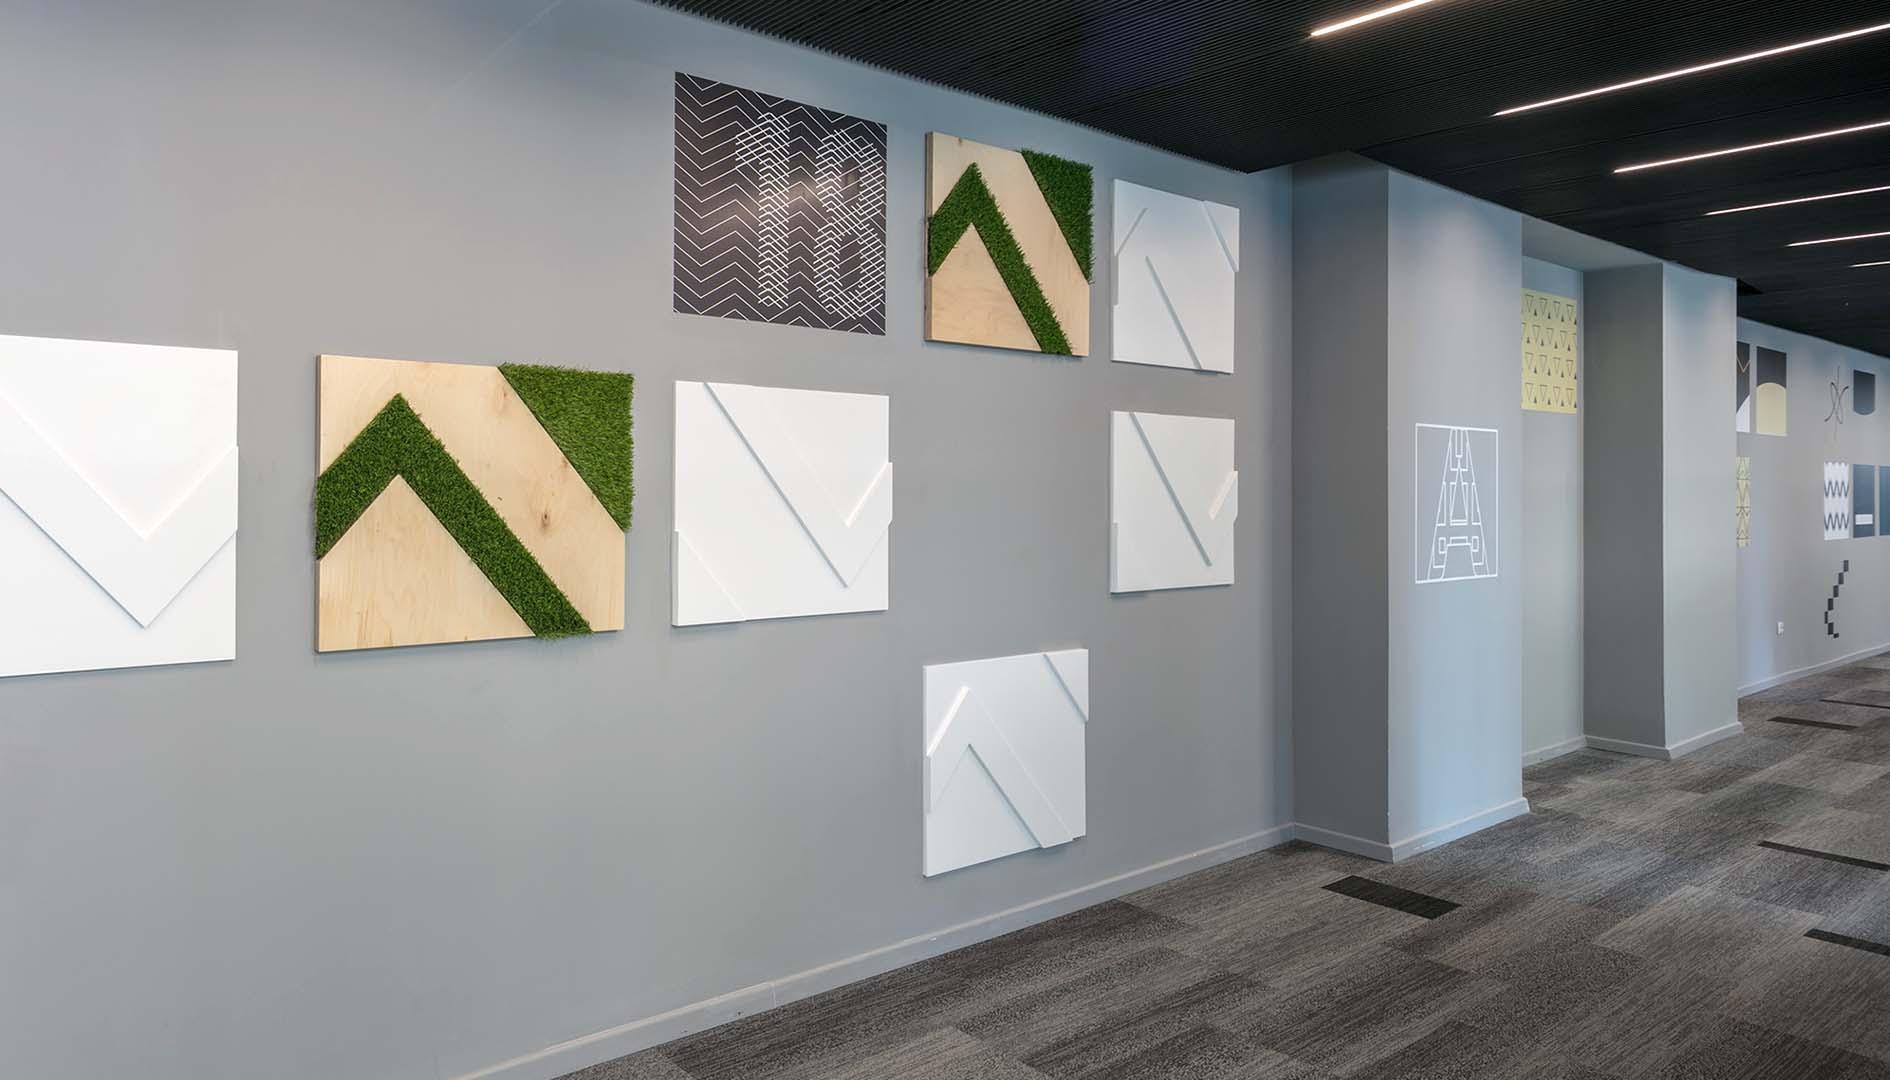 Ey Corridor Design 11